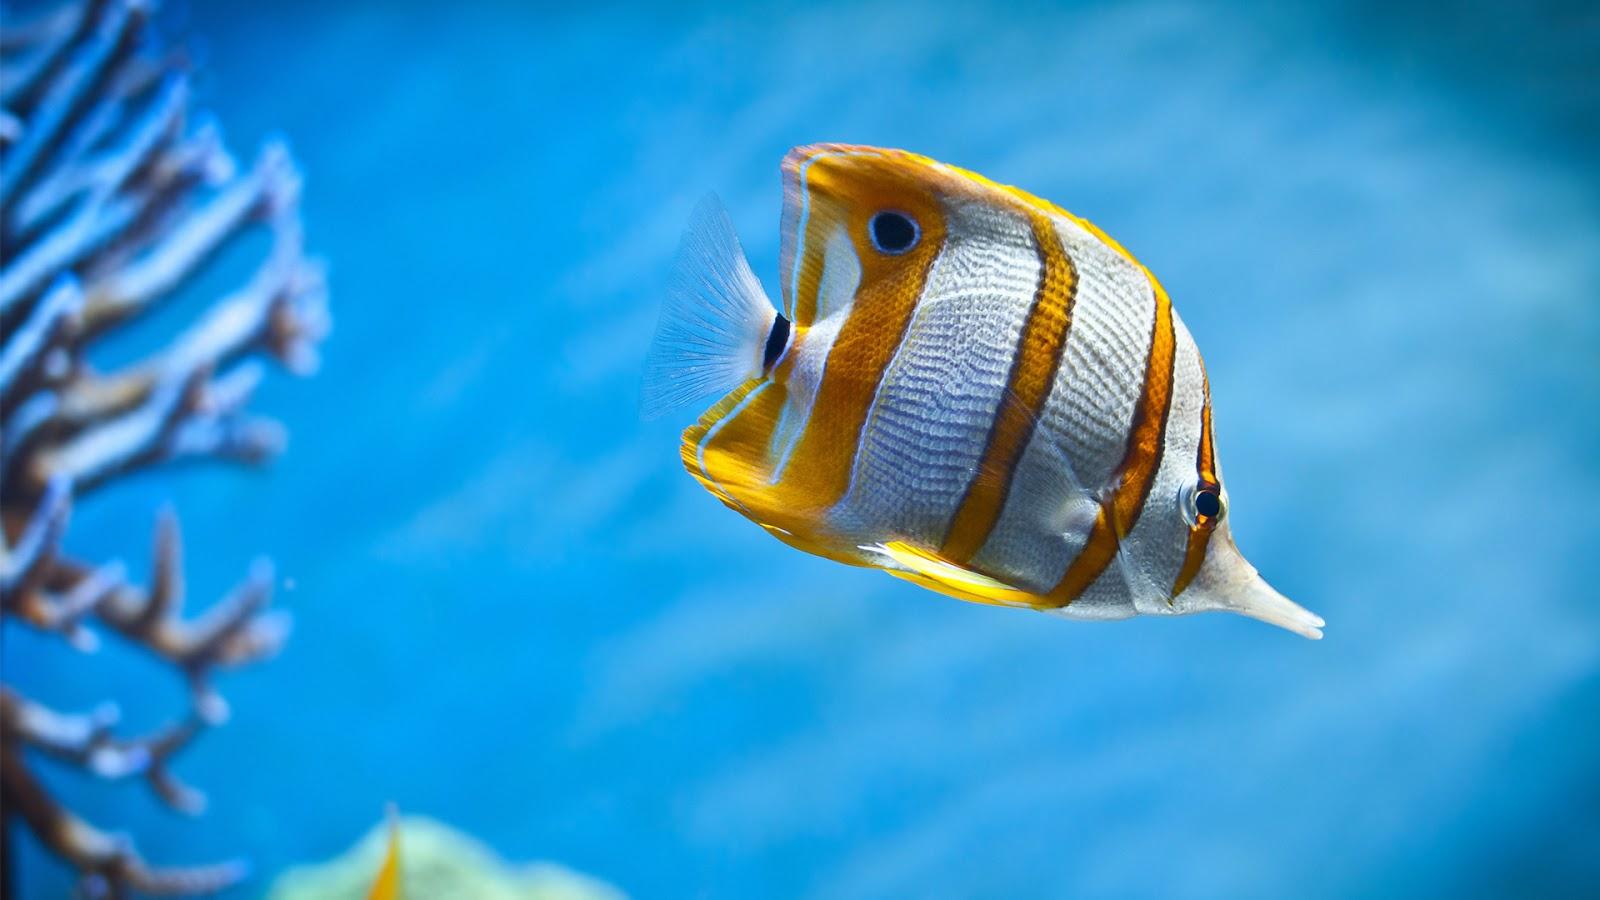 Beautiful Sea Fish | HD Wallpapers (High Definition ...